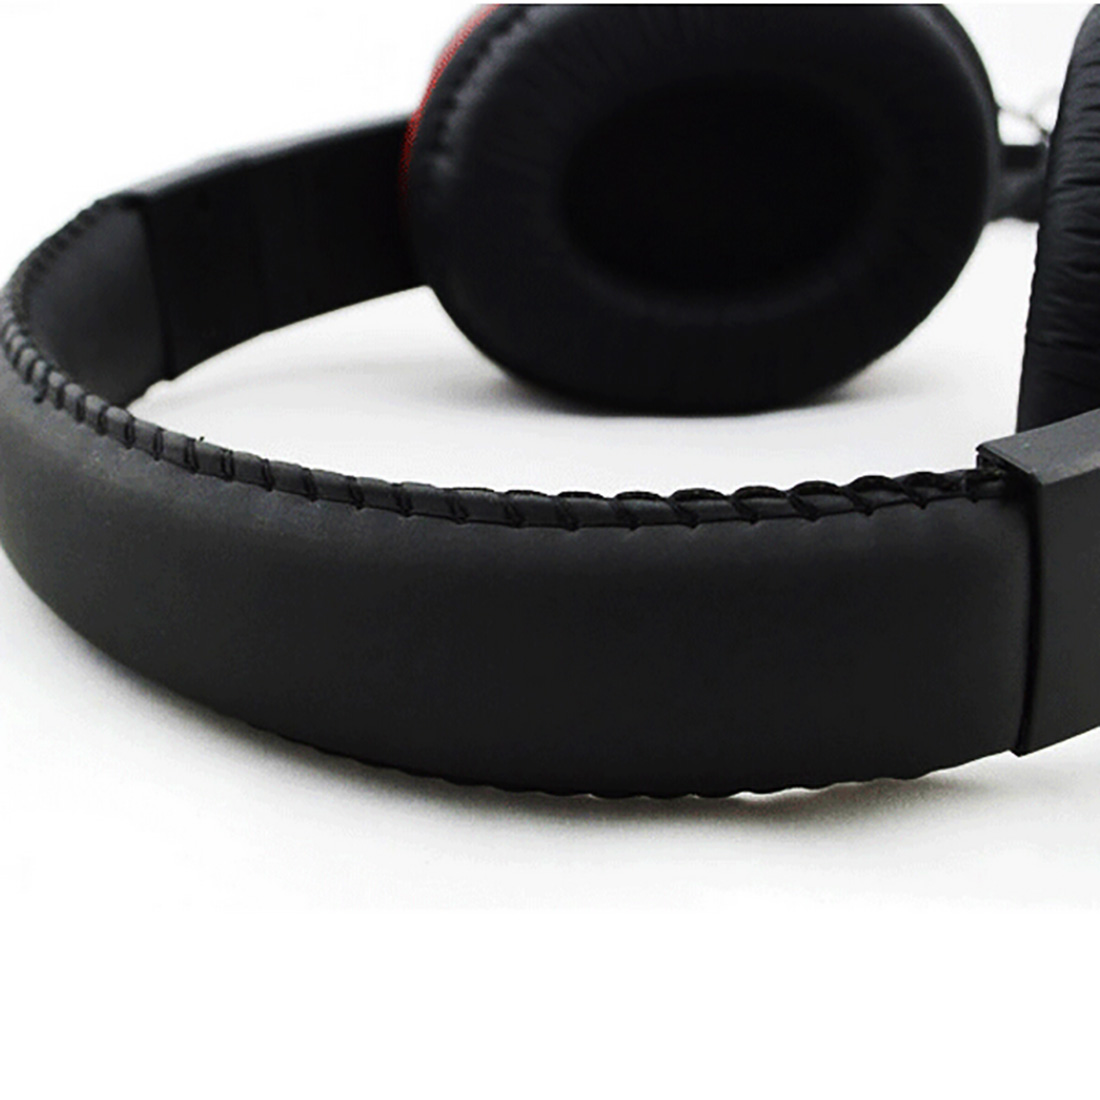 Marsnaska Gamer Over-ear Game Gaming Headphone Headset Earphone Headband with Mic Stereo Bass for xbox 360